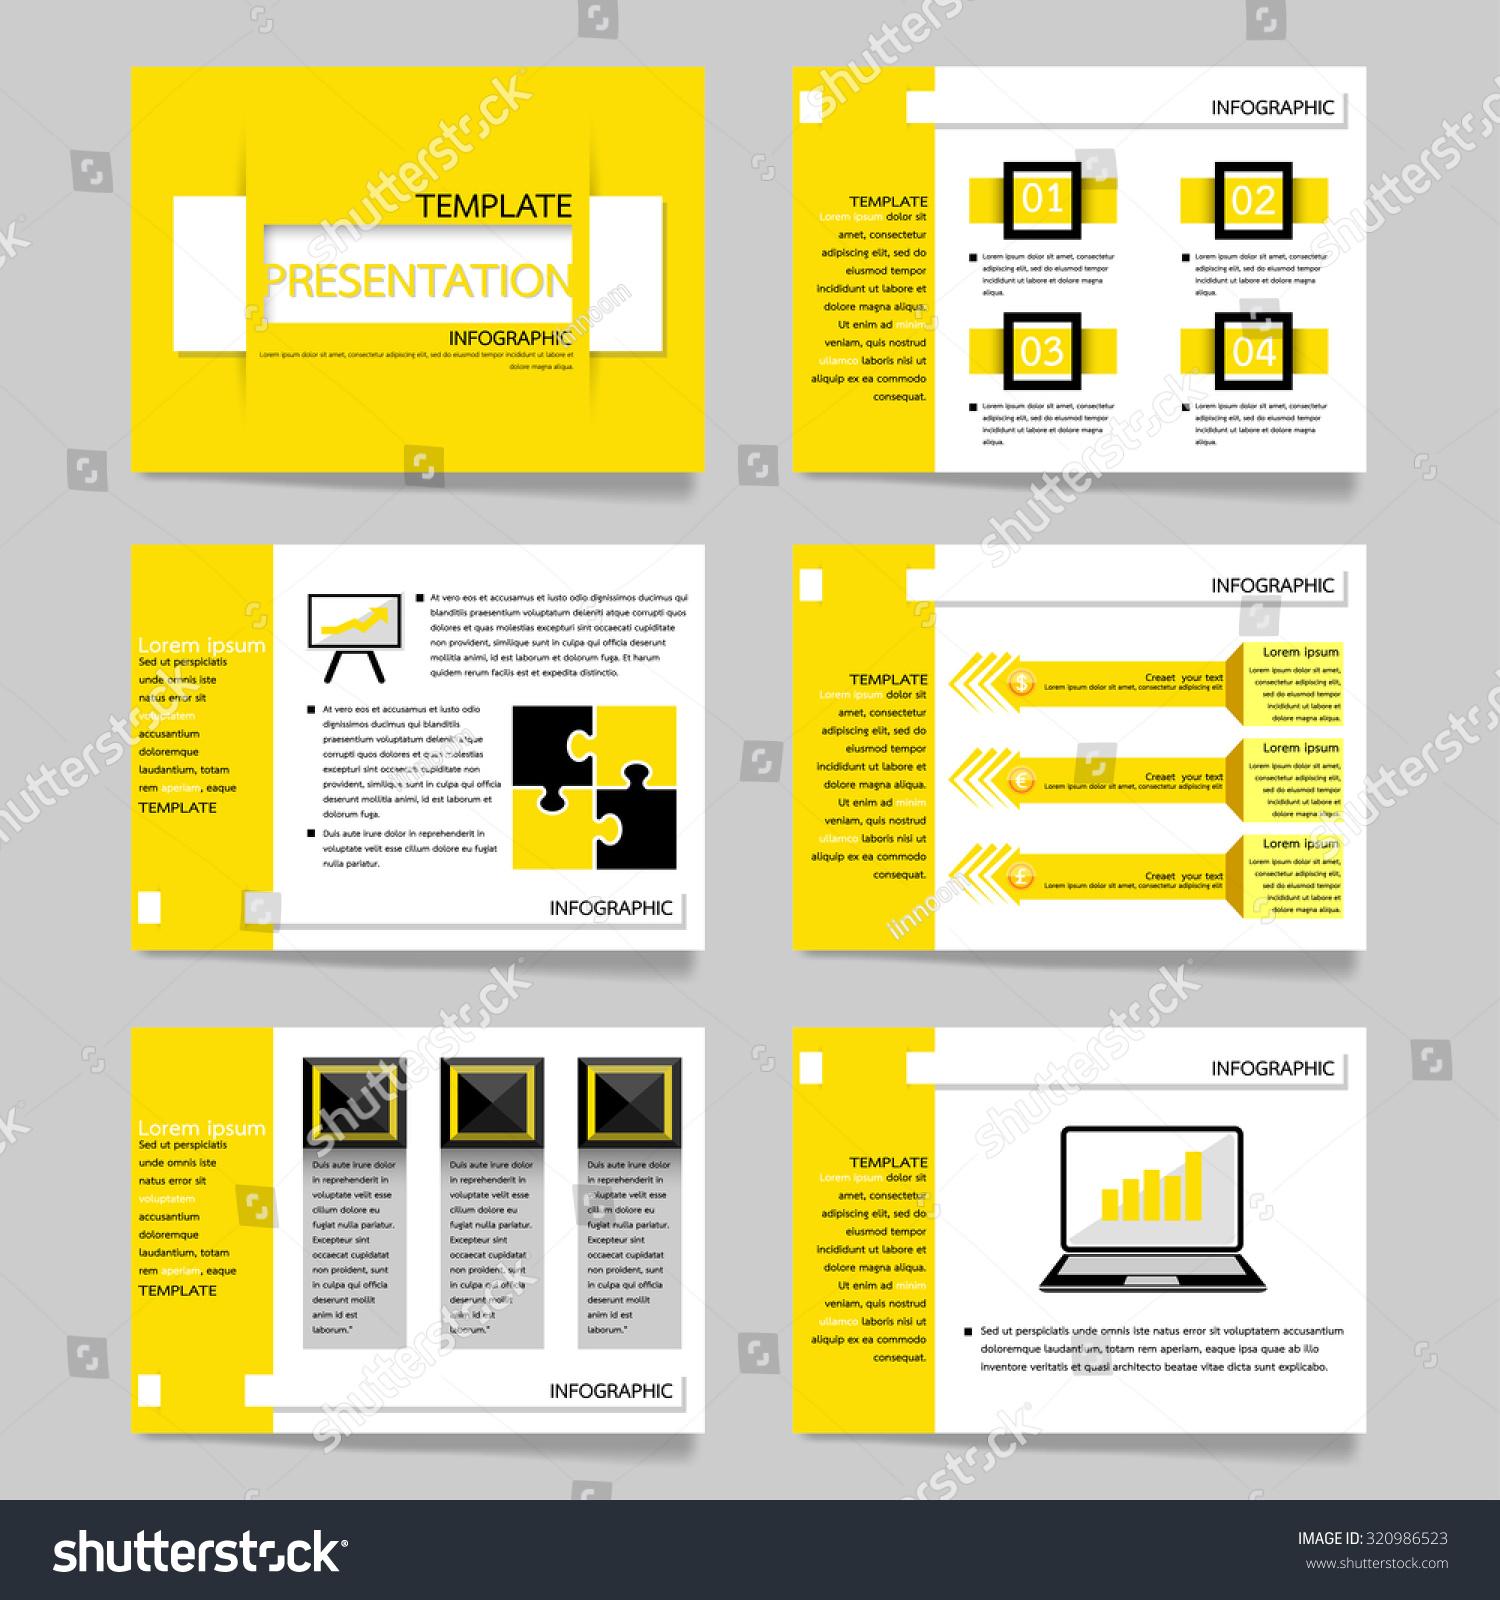 Presentation Layout Design Free – wolfcoin.net